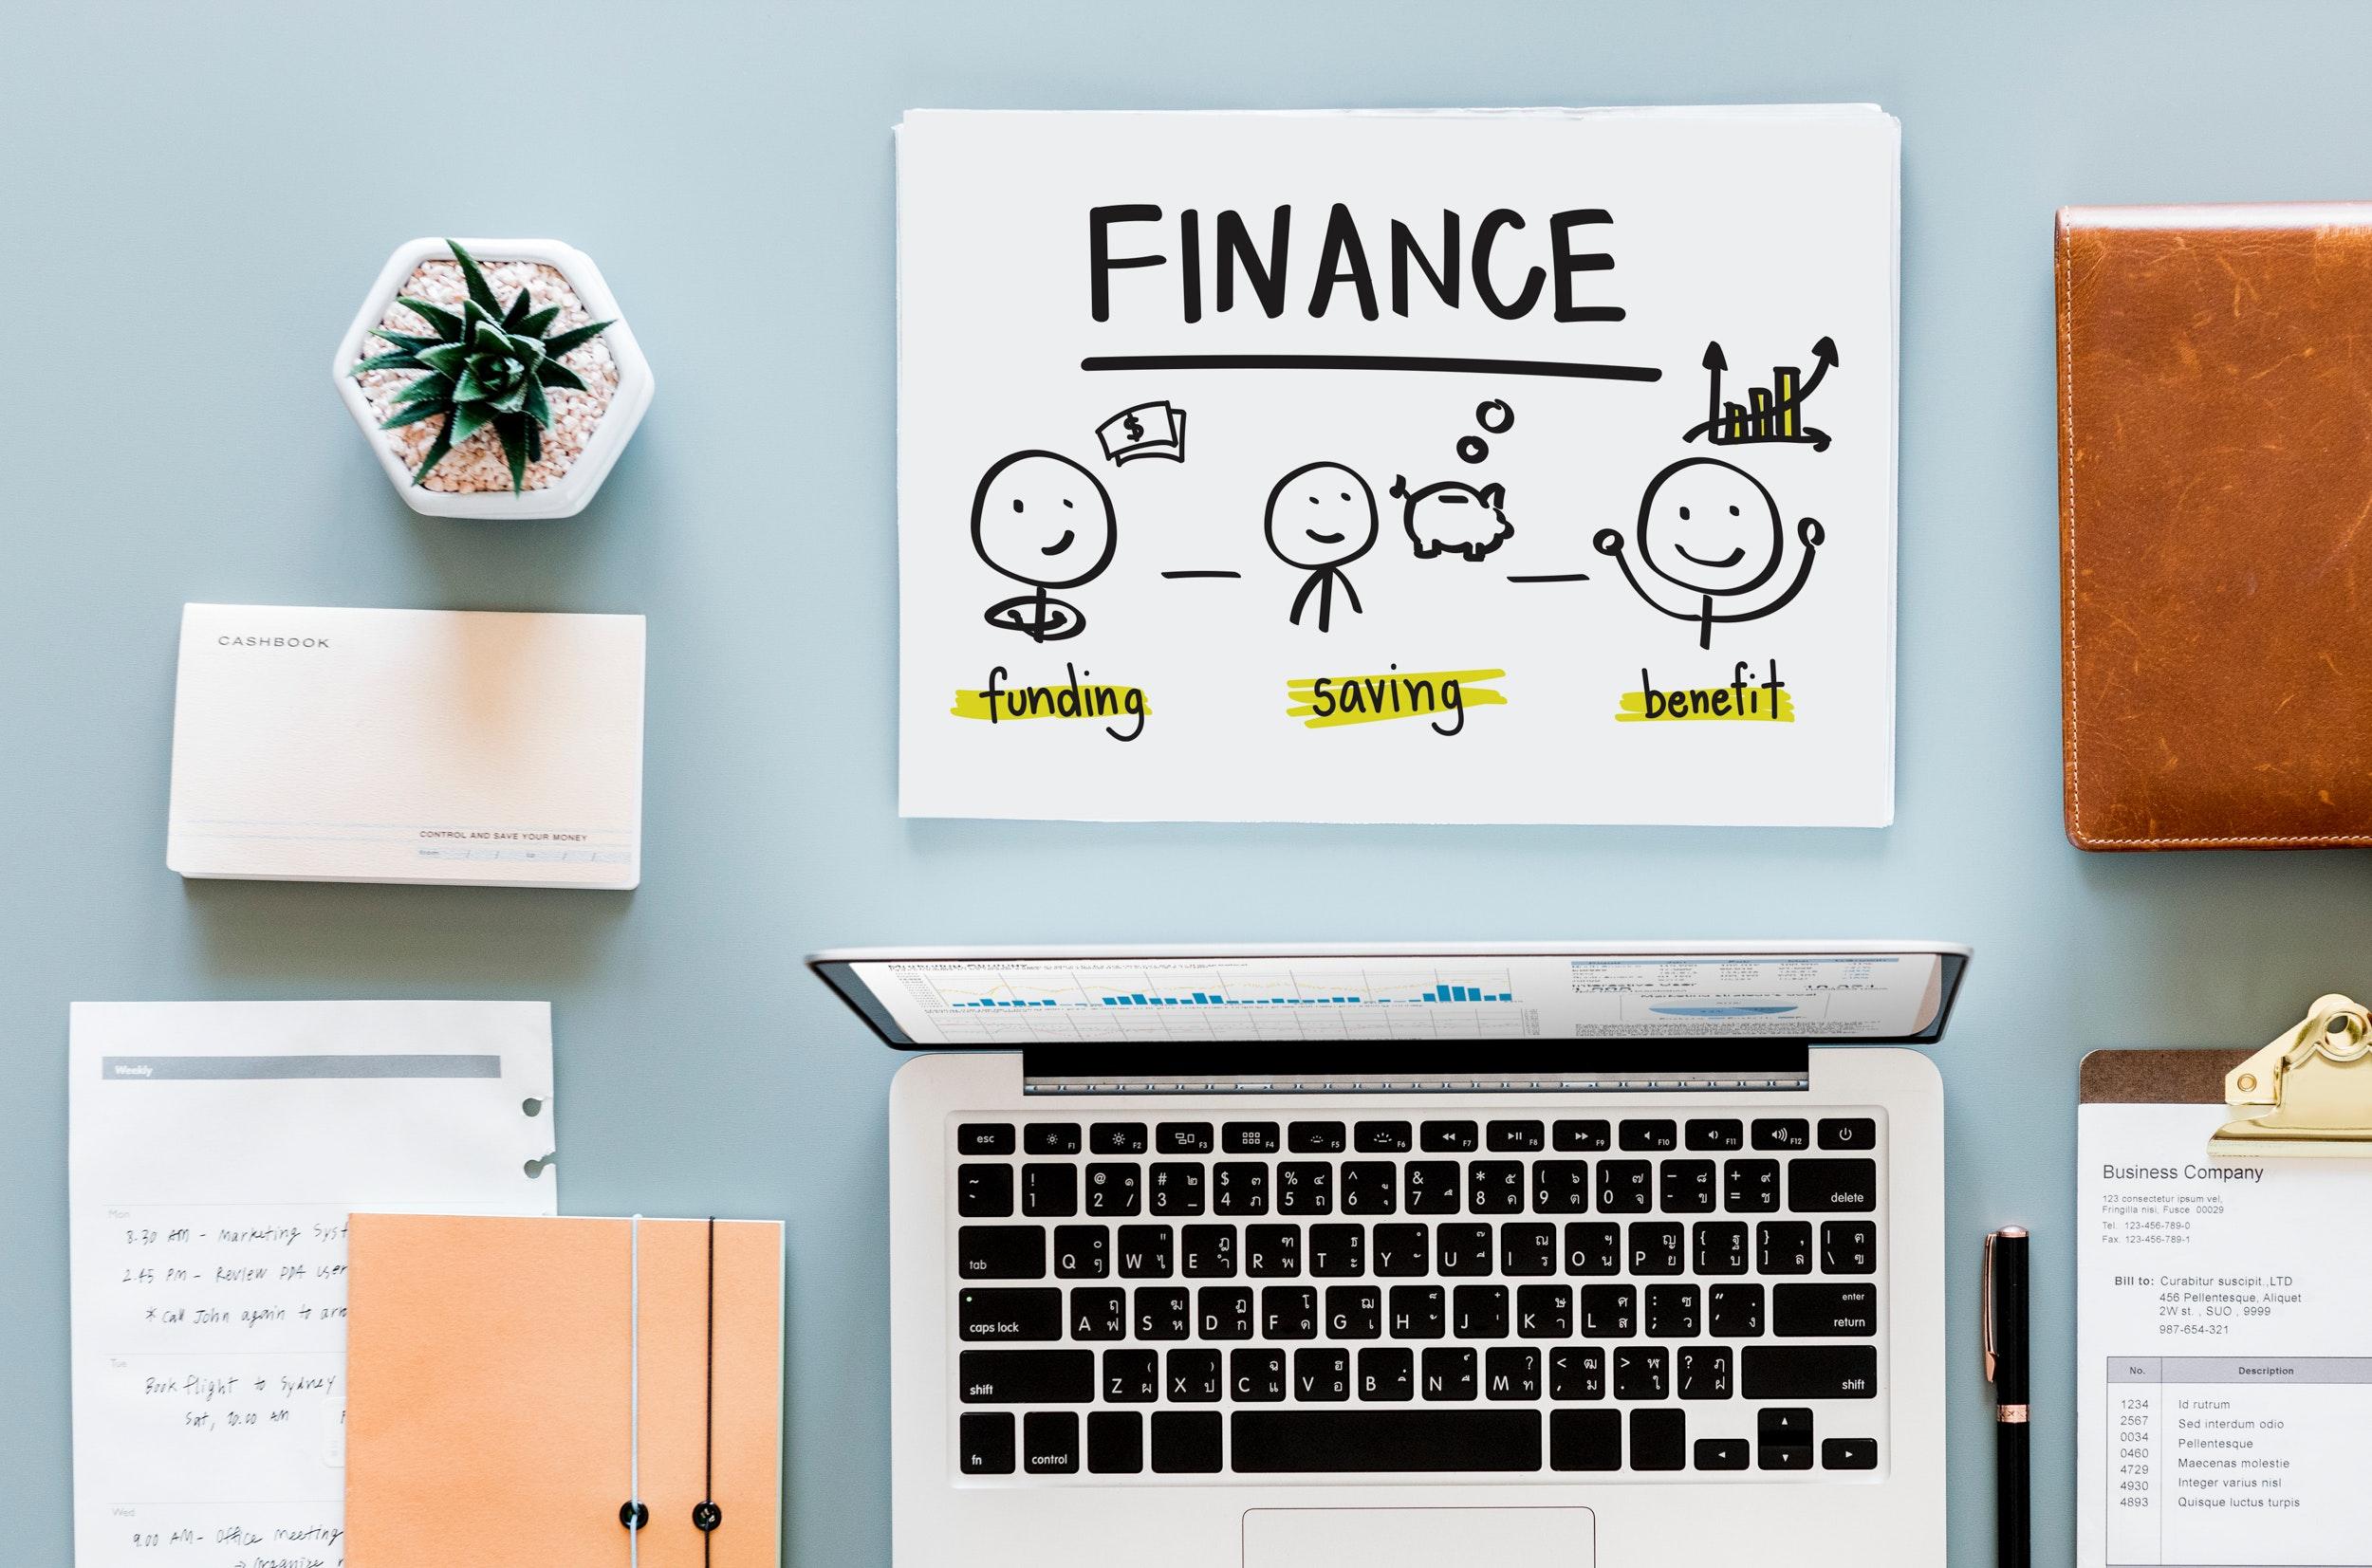 Finance Sketch Near Laptop Computer, Business, Office, Workplace, Wireless, HQ Photo